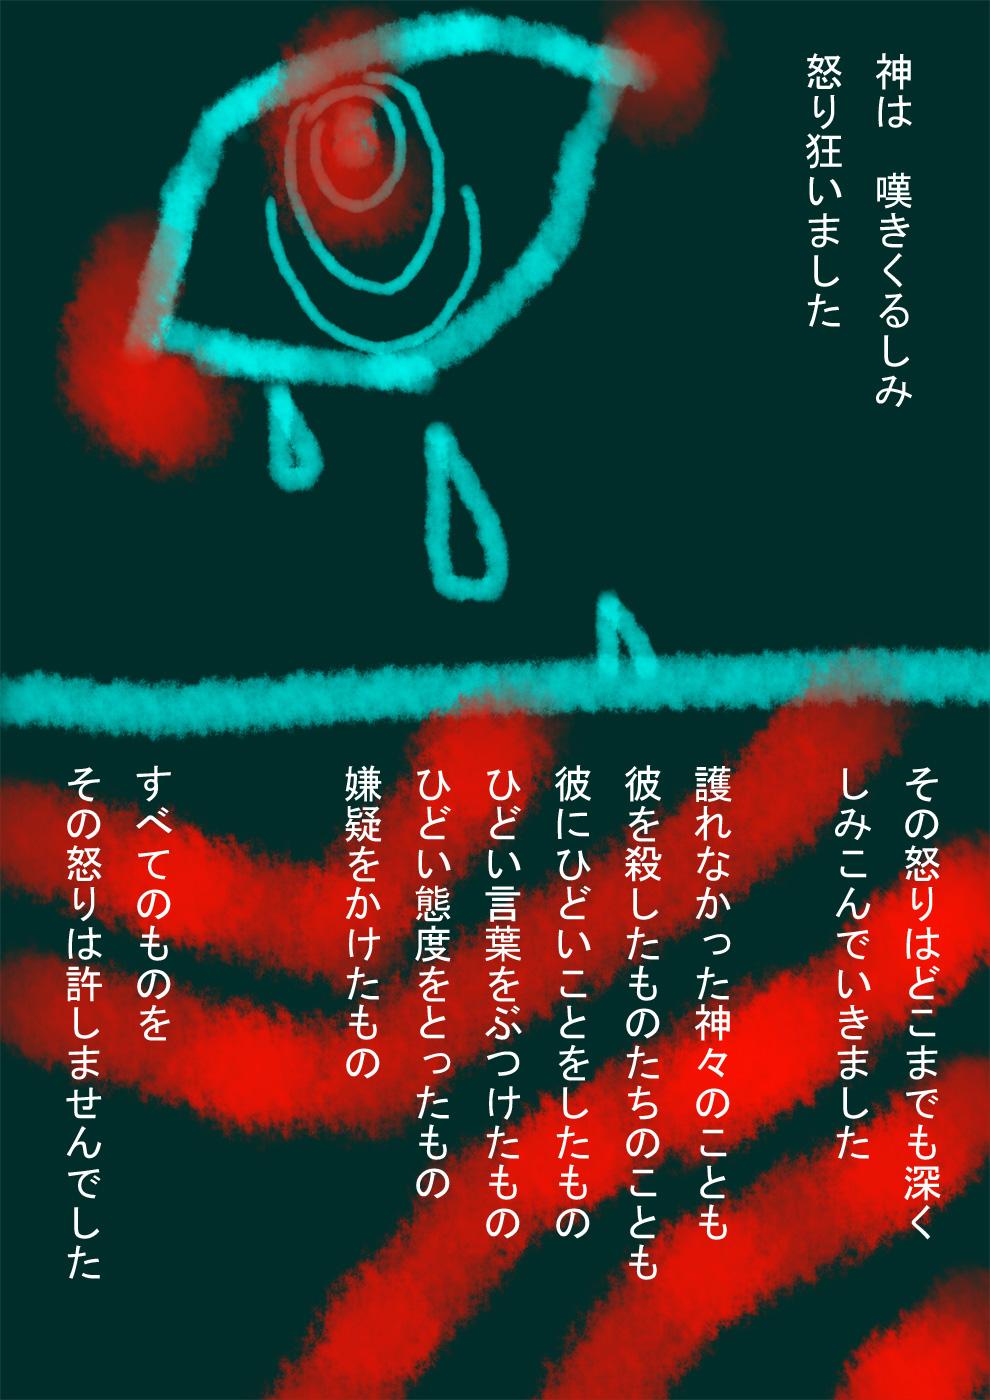 http://ahito.com/comic/ehon/kamiuta/img/2018/20180315/02.jpg